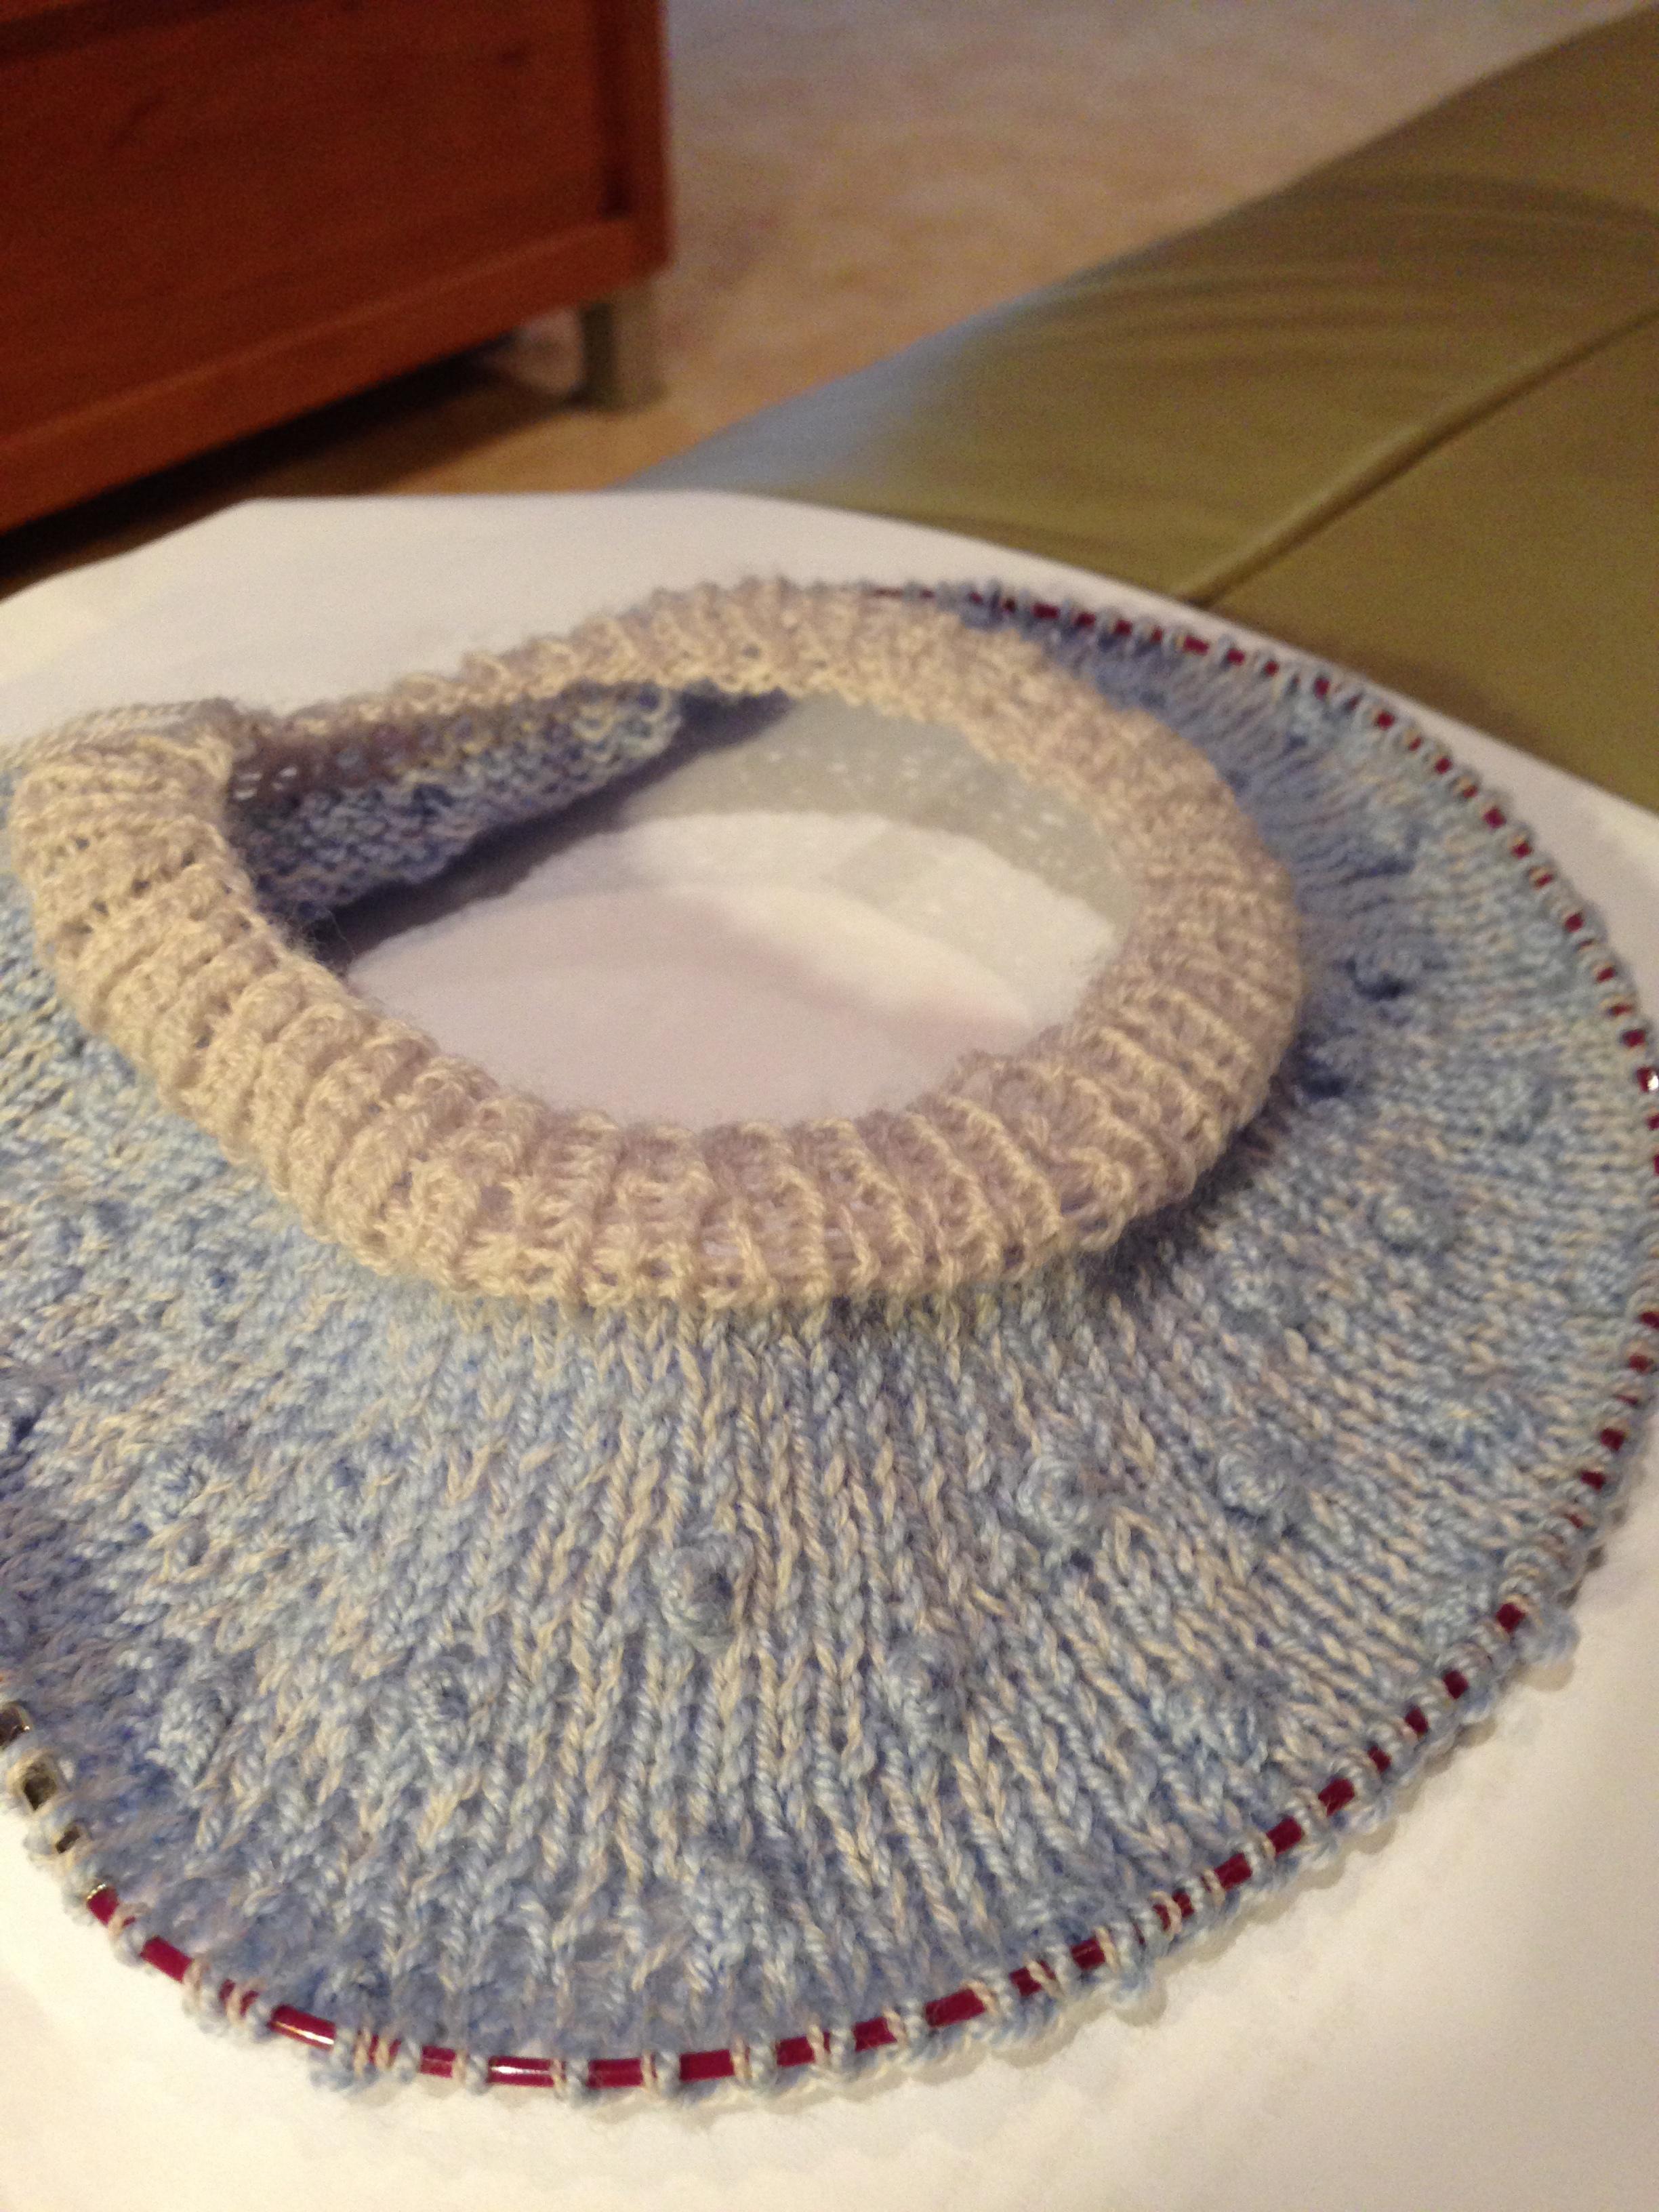 bobble yoke sweater | Gippsland Granny